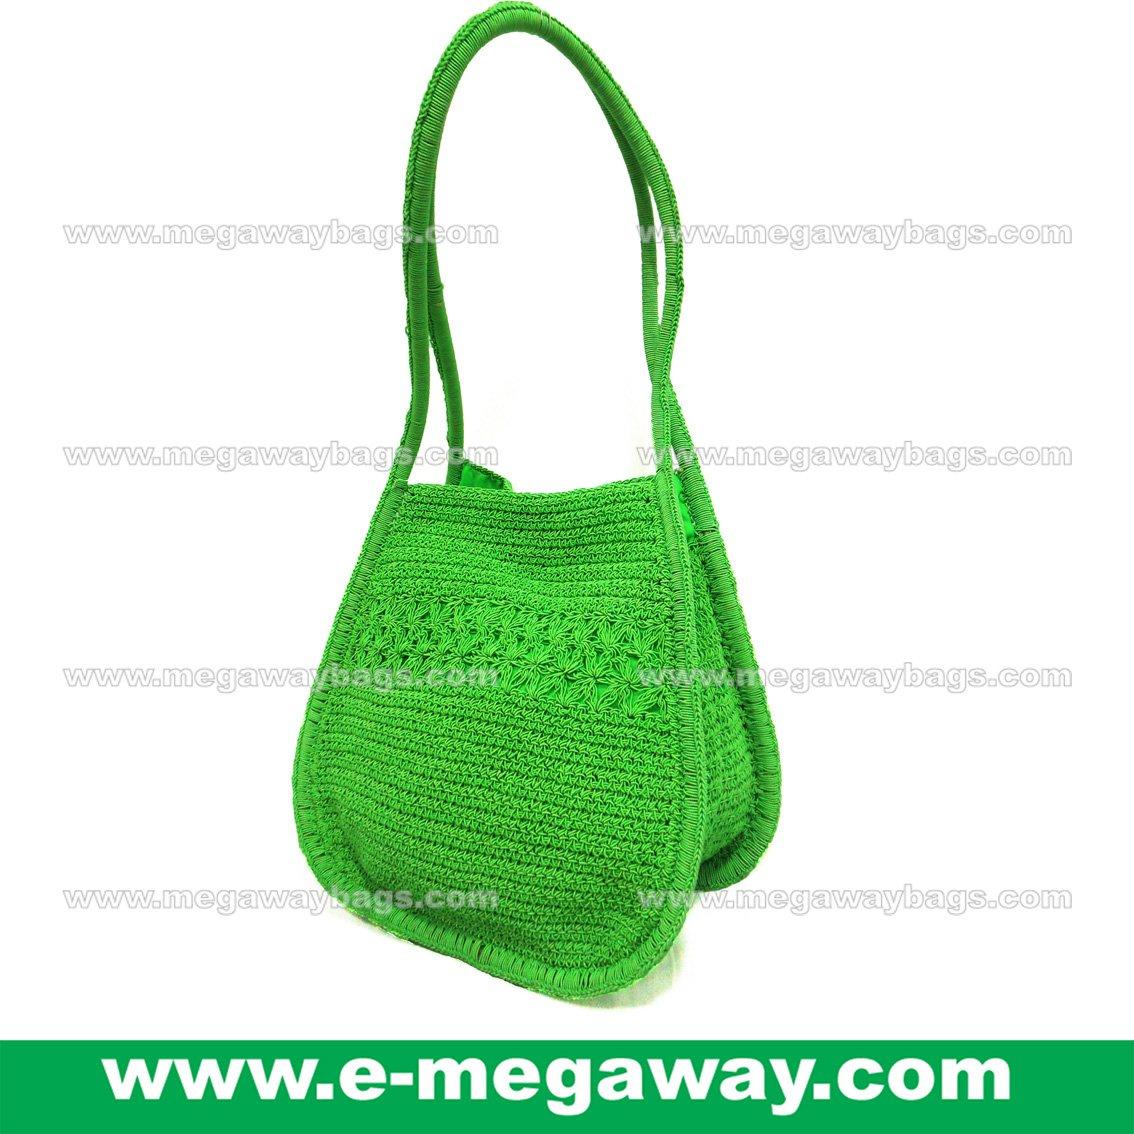 Shoulder Crochet Bags Straw Knitted Crafts Tote Handbags Taschen MegawayBags #CC-1042B